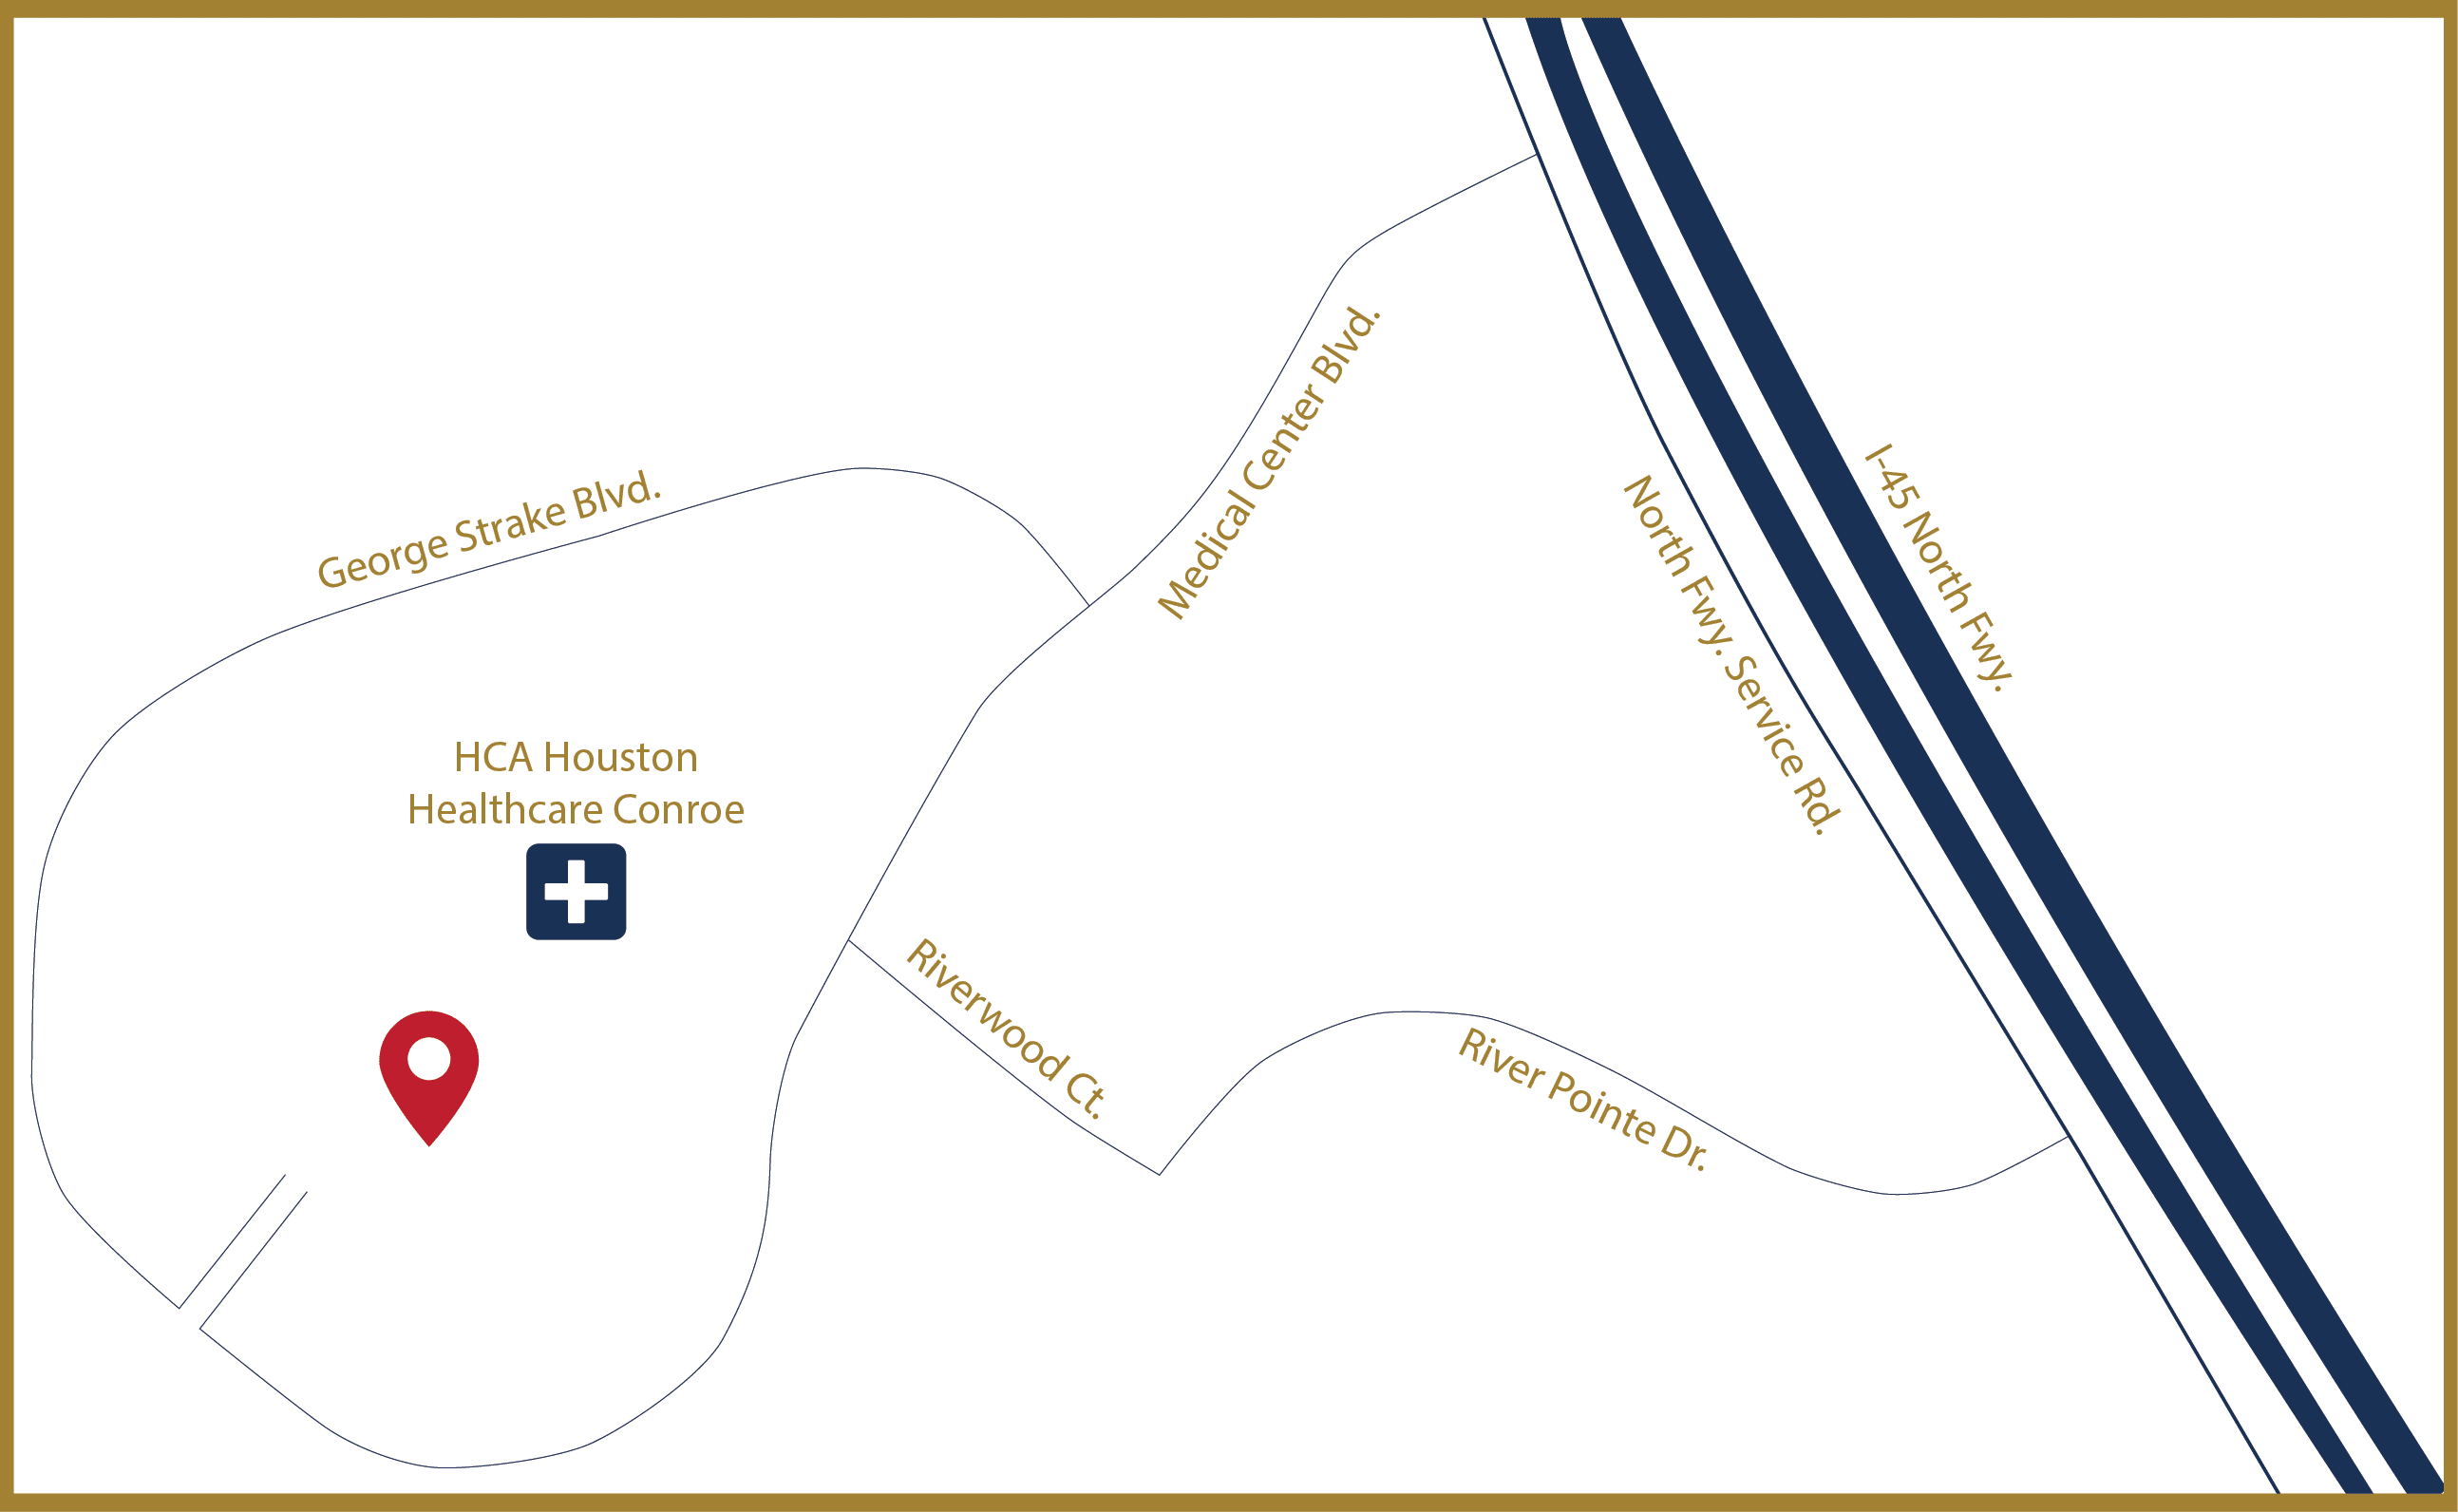 506 Medical Center Blvd. Map